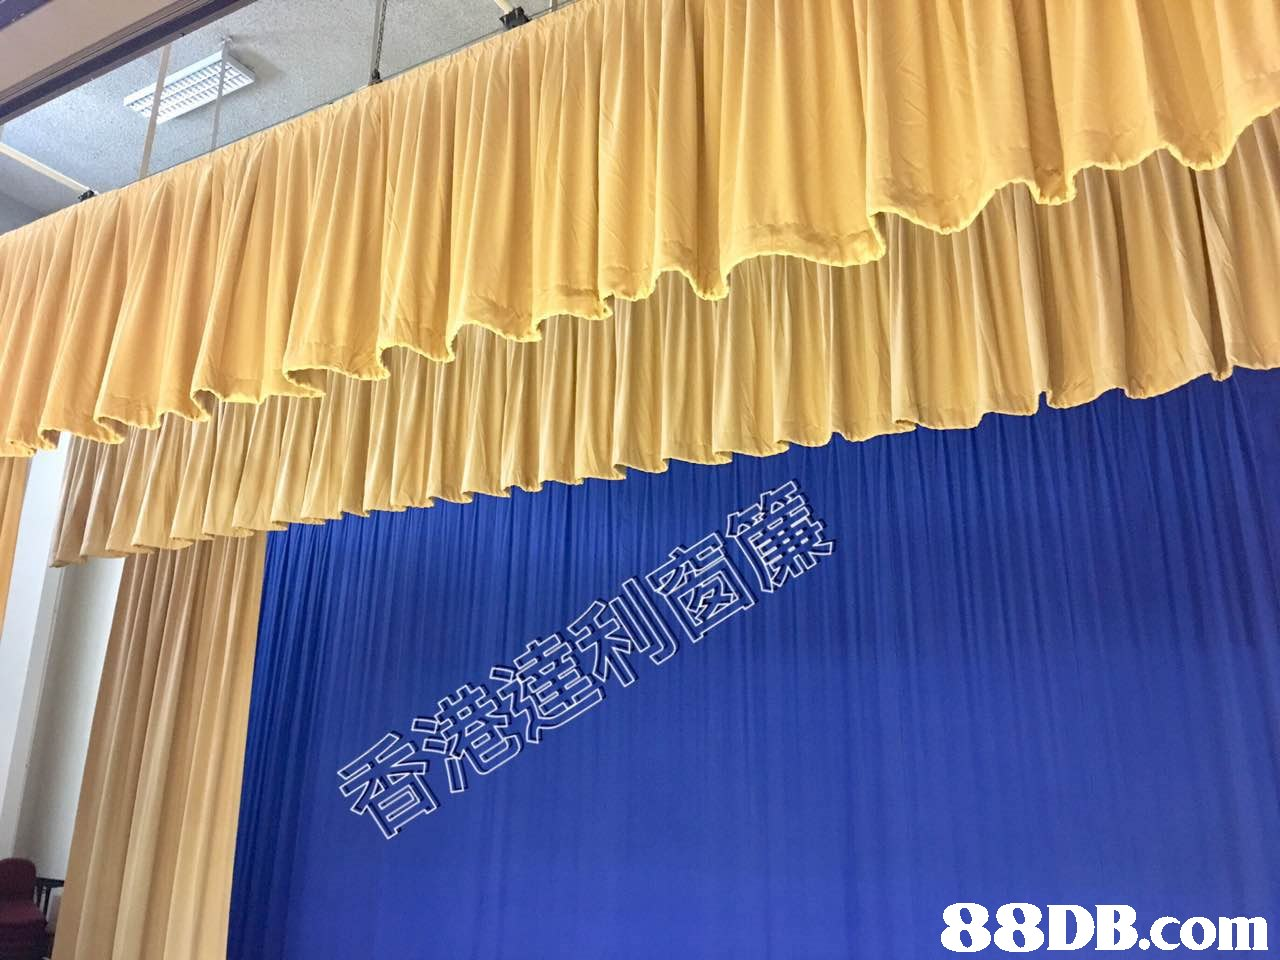 yellow,curtain,light,interior design,textile